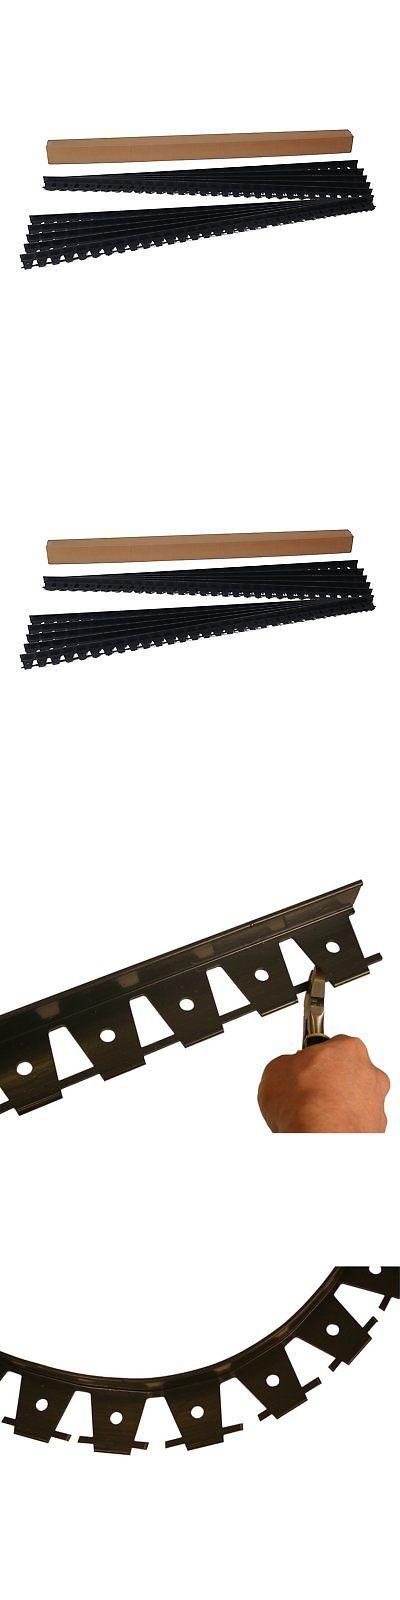 Railroad Ties 112585: Easyflex Plastic Commercial Grade ...